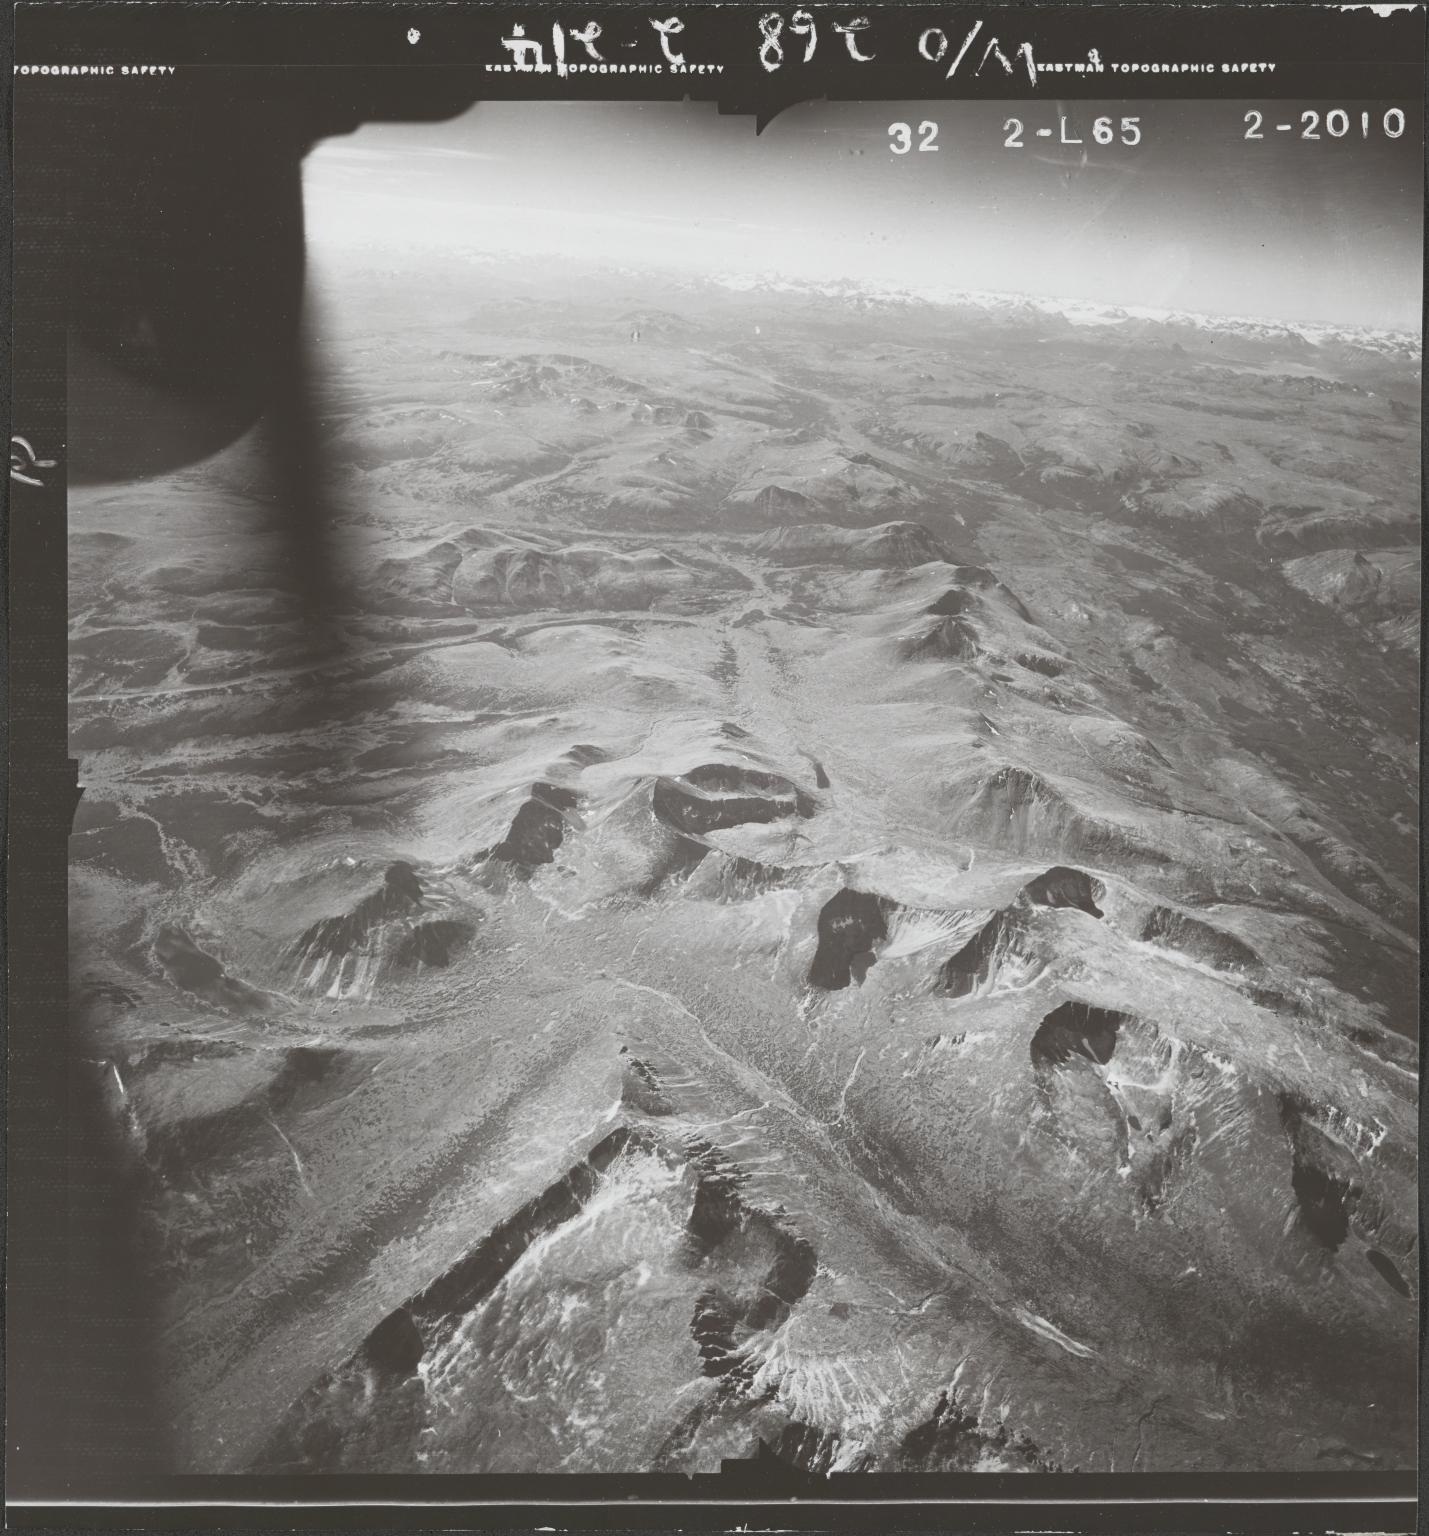 Trout Lake, aerial photograph FL 47 L-65, British Columbia